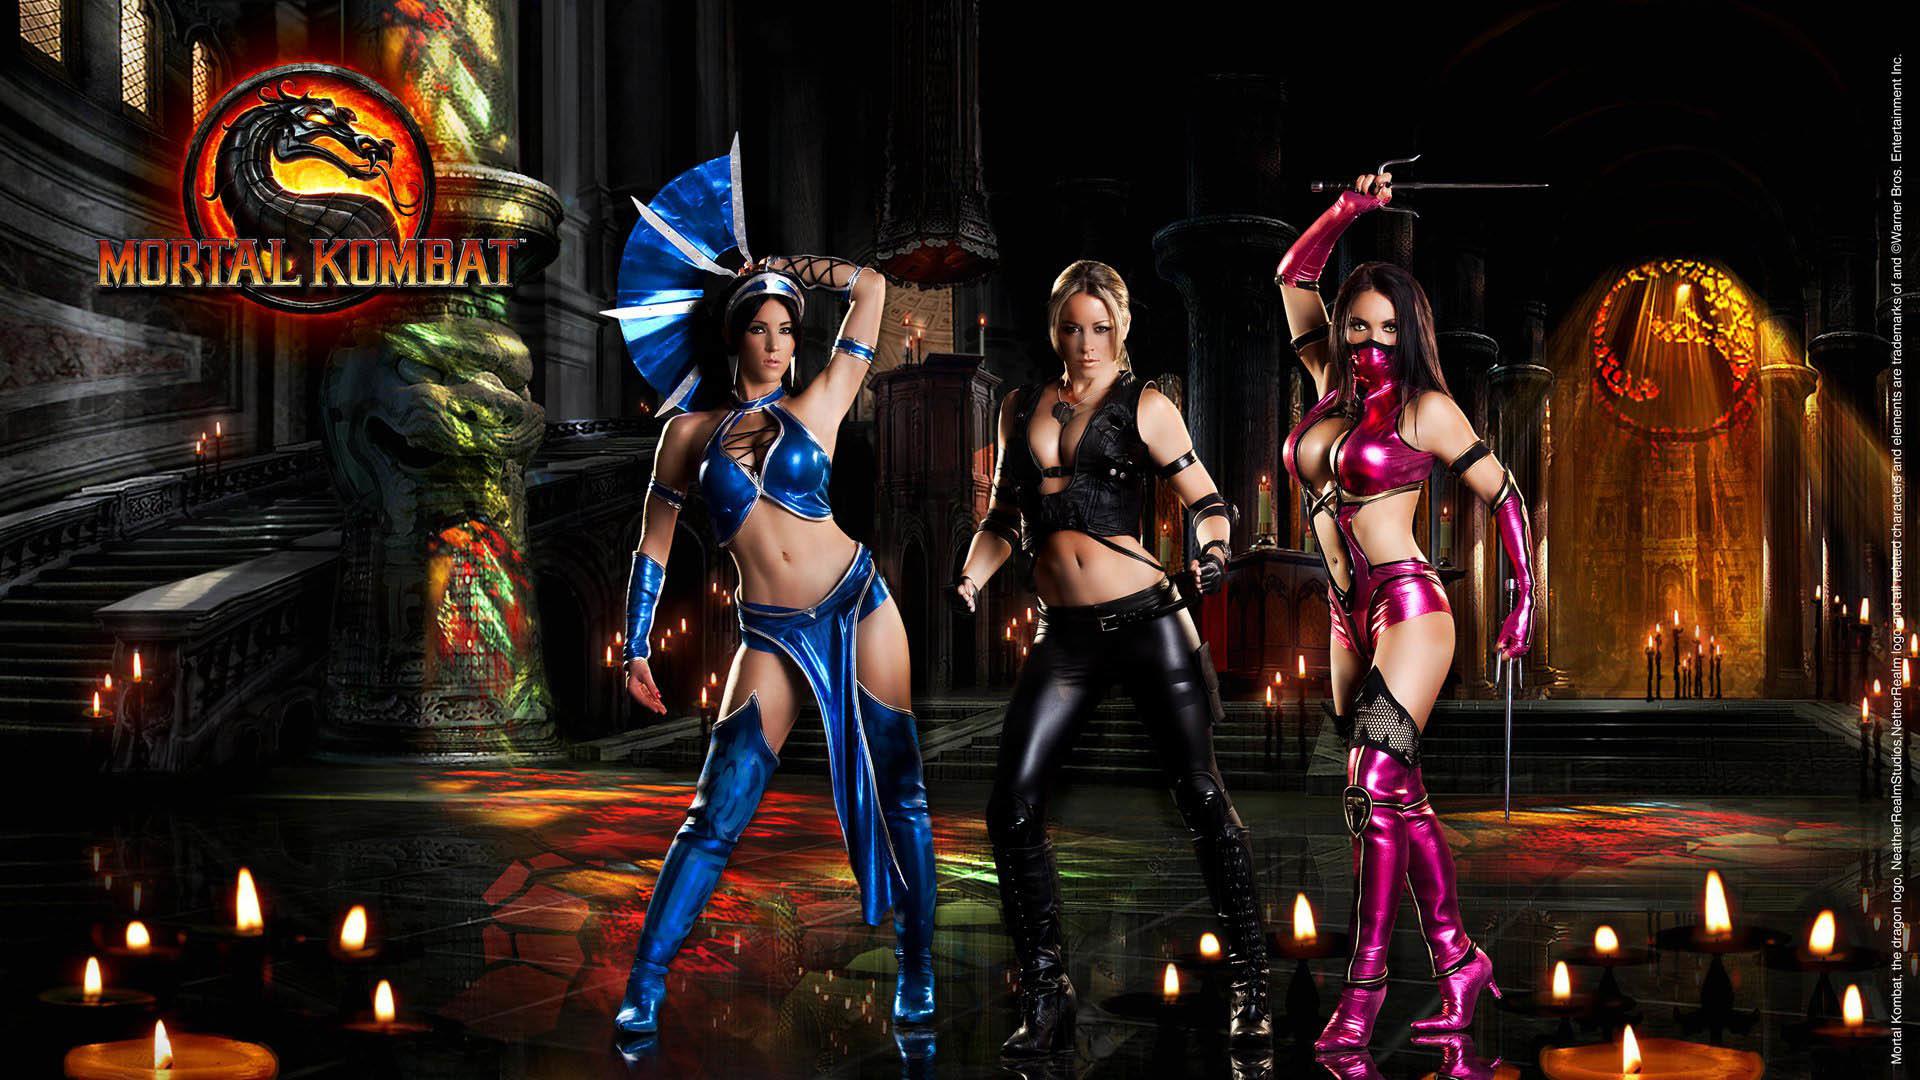 Mortal Kombat X Kitana Wallpaper (77+ images)